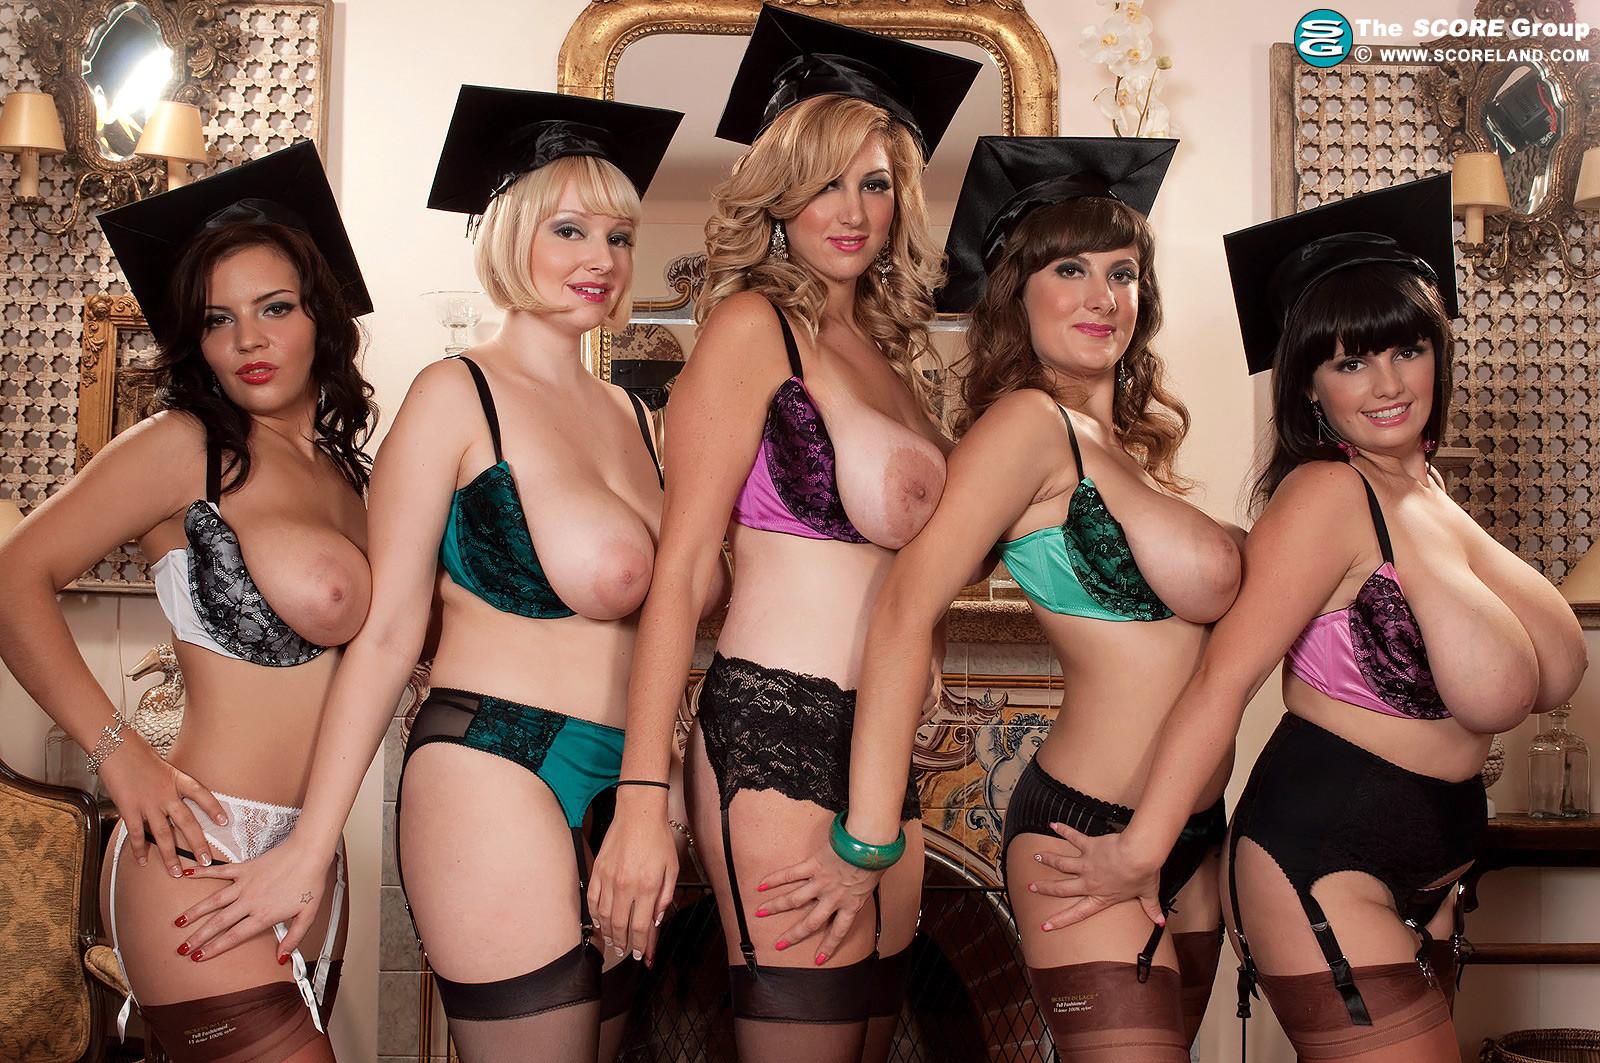 Amature russian women nude